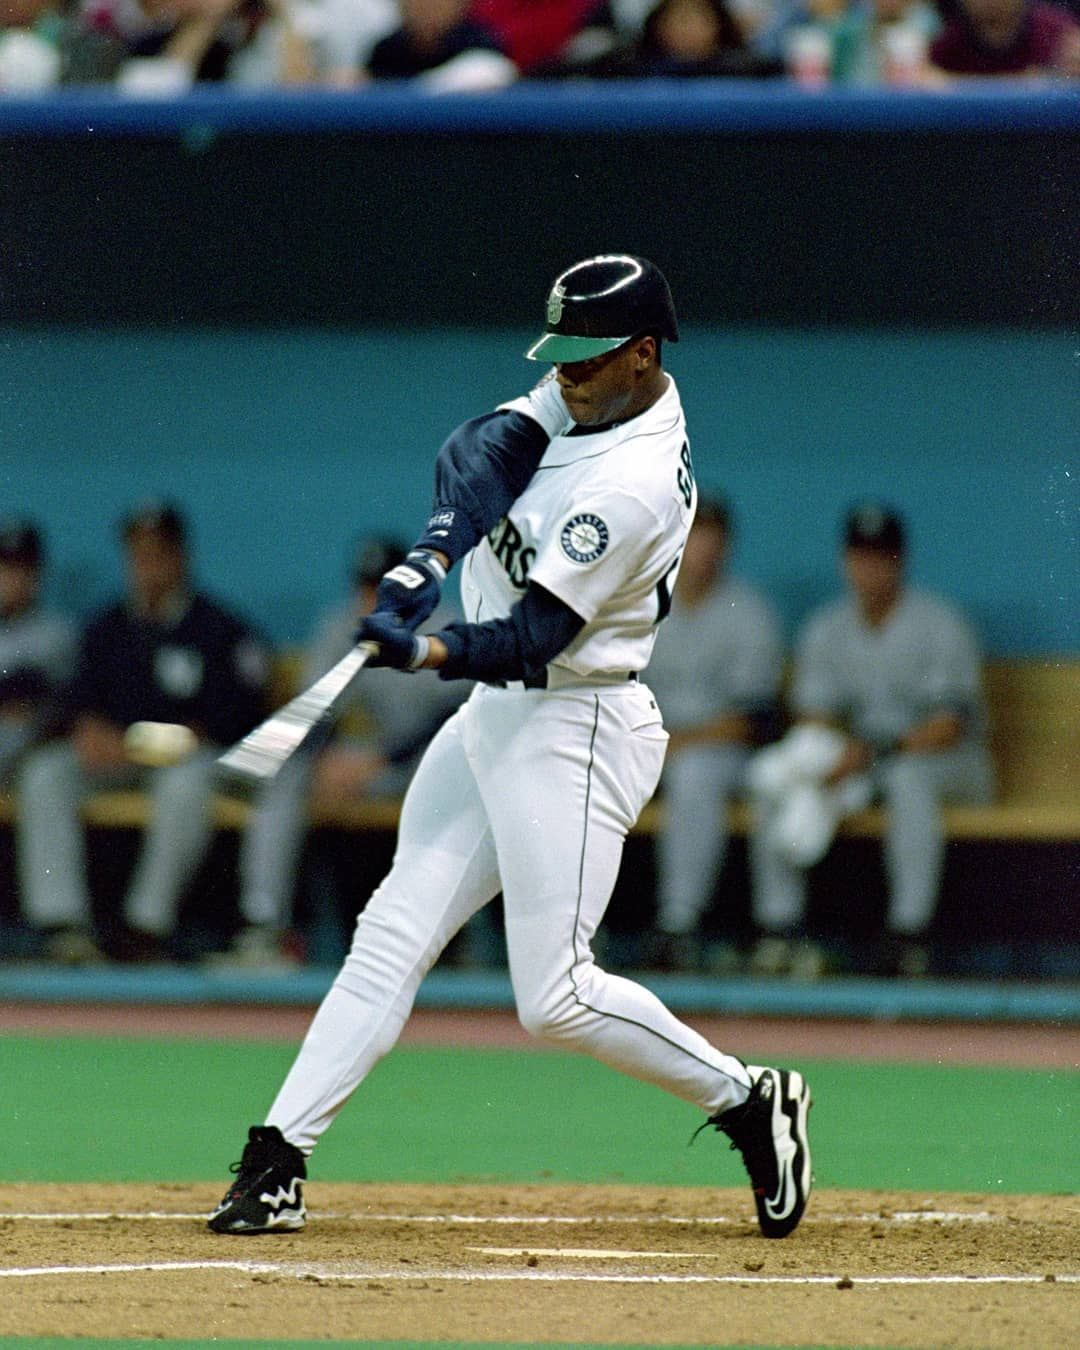 Mlb On Fox On Instagram The Definition Of A Perfect Swing Via Mlb In 2020 Major League Baseball Teams Seattle Sports Ken Griffey Jr